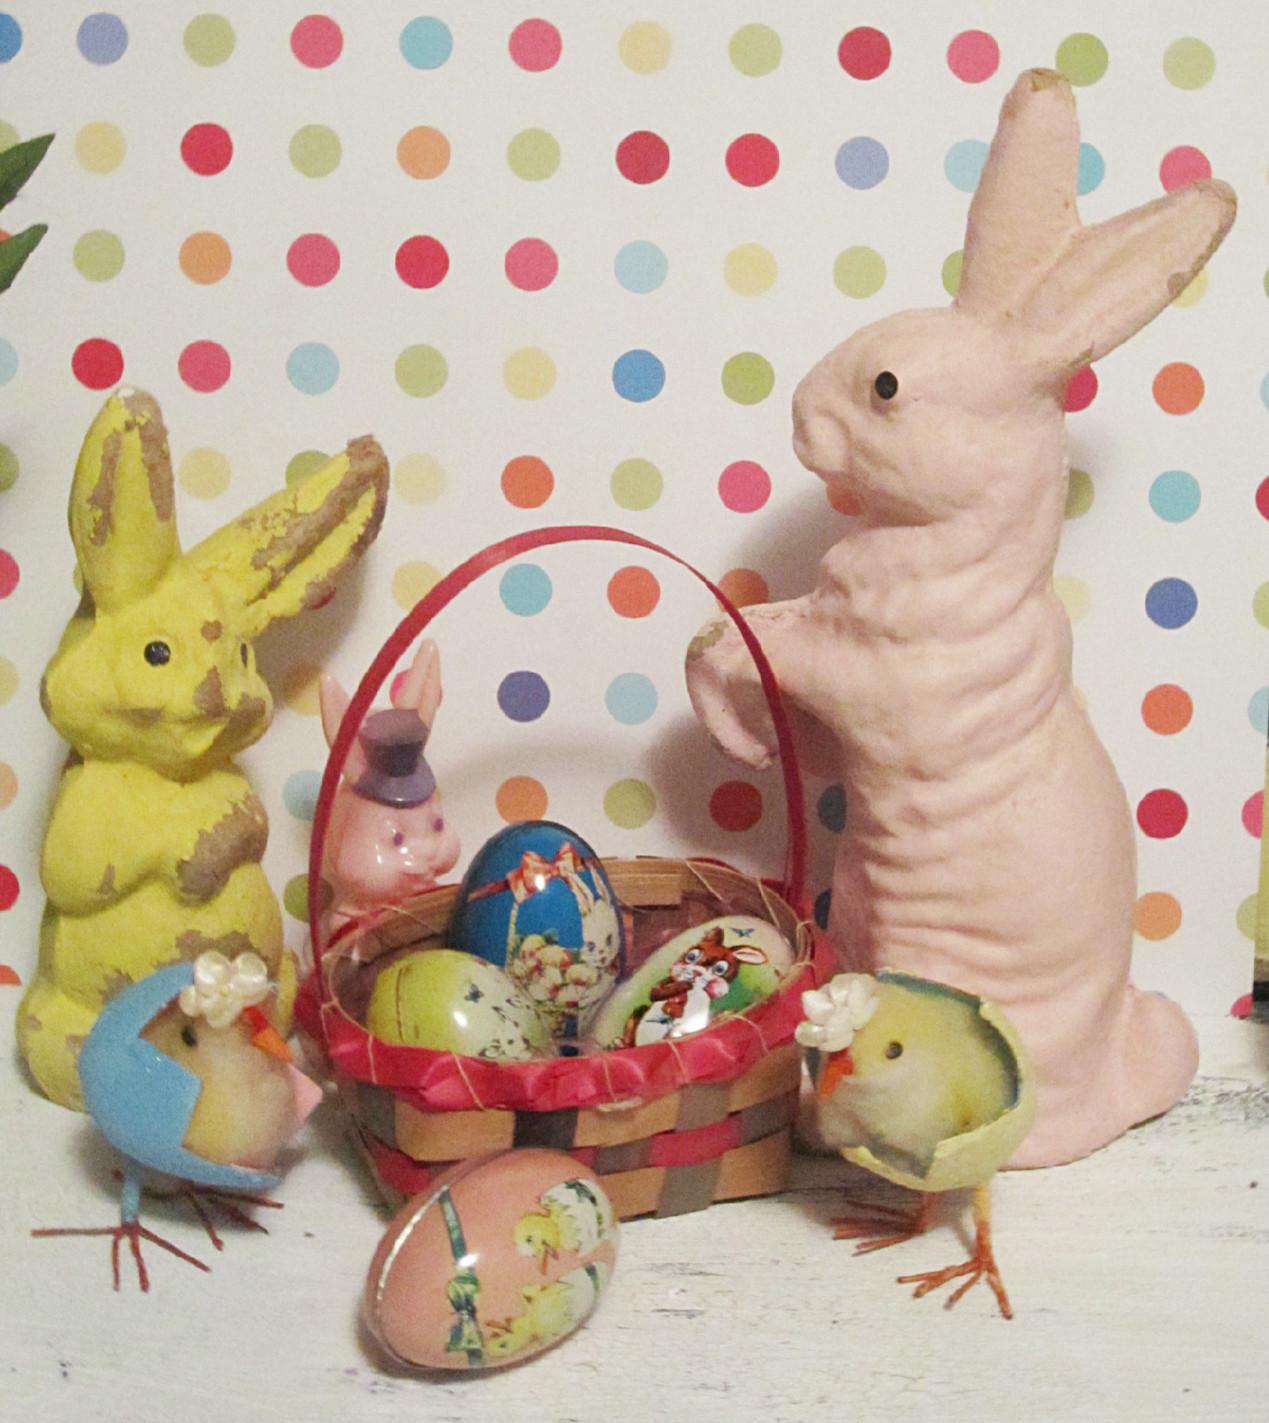 Easter Things: Golden Egg Vintage: Vintage Thingie Thursday: Easter Things